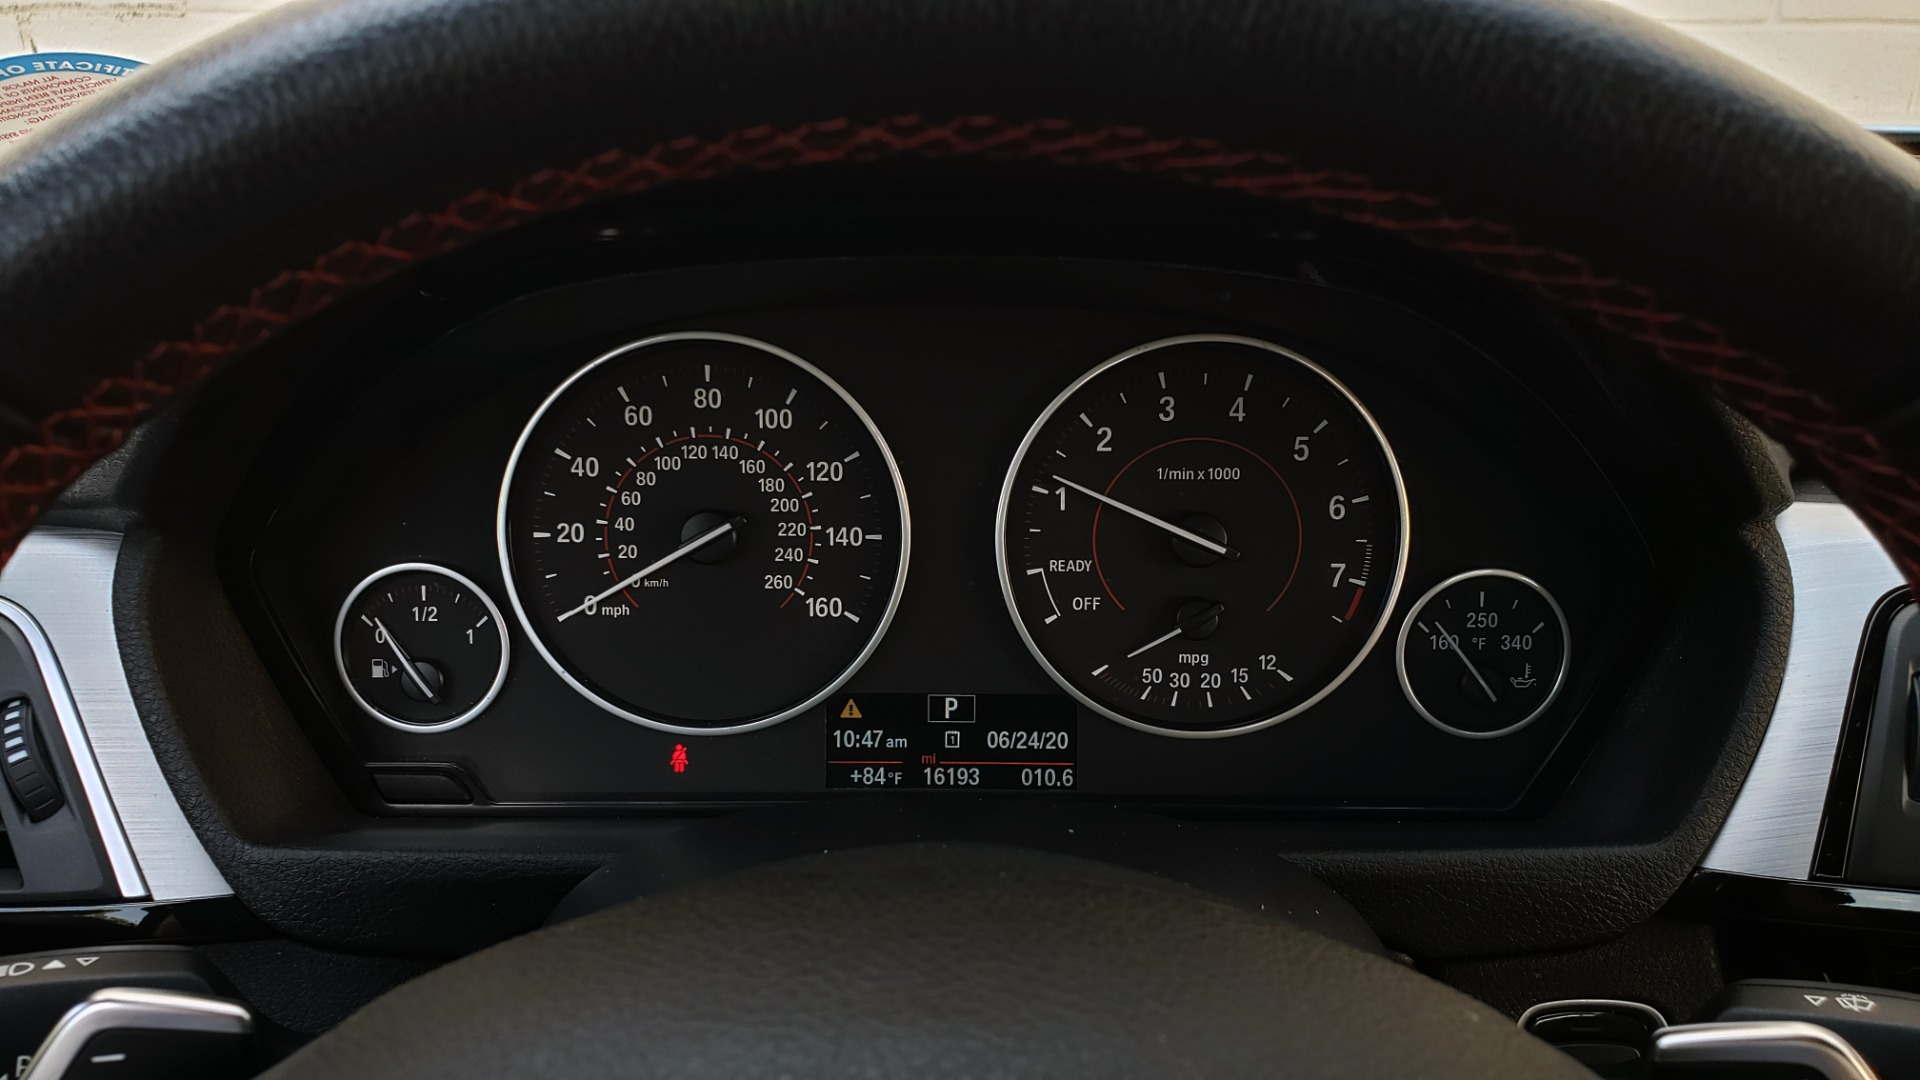 Used 2017 BMW 3 SERIES 330I SPORT SEDAN / DRVR ASST PKG / SUNROOF / REARVIEW for sale Sold at Formula Imports in Charlotte NC 28227 39